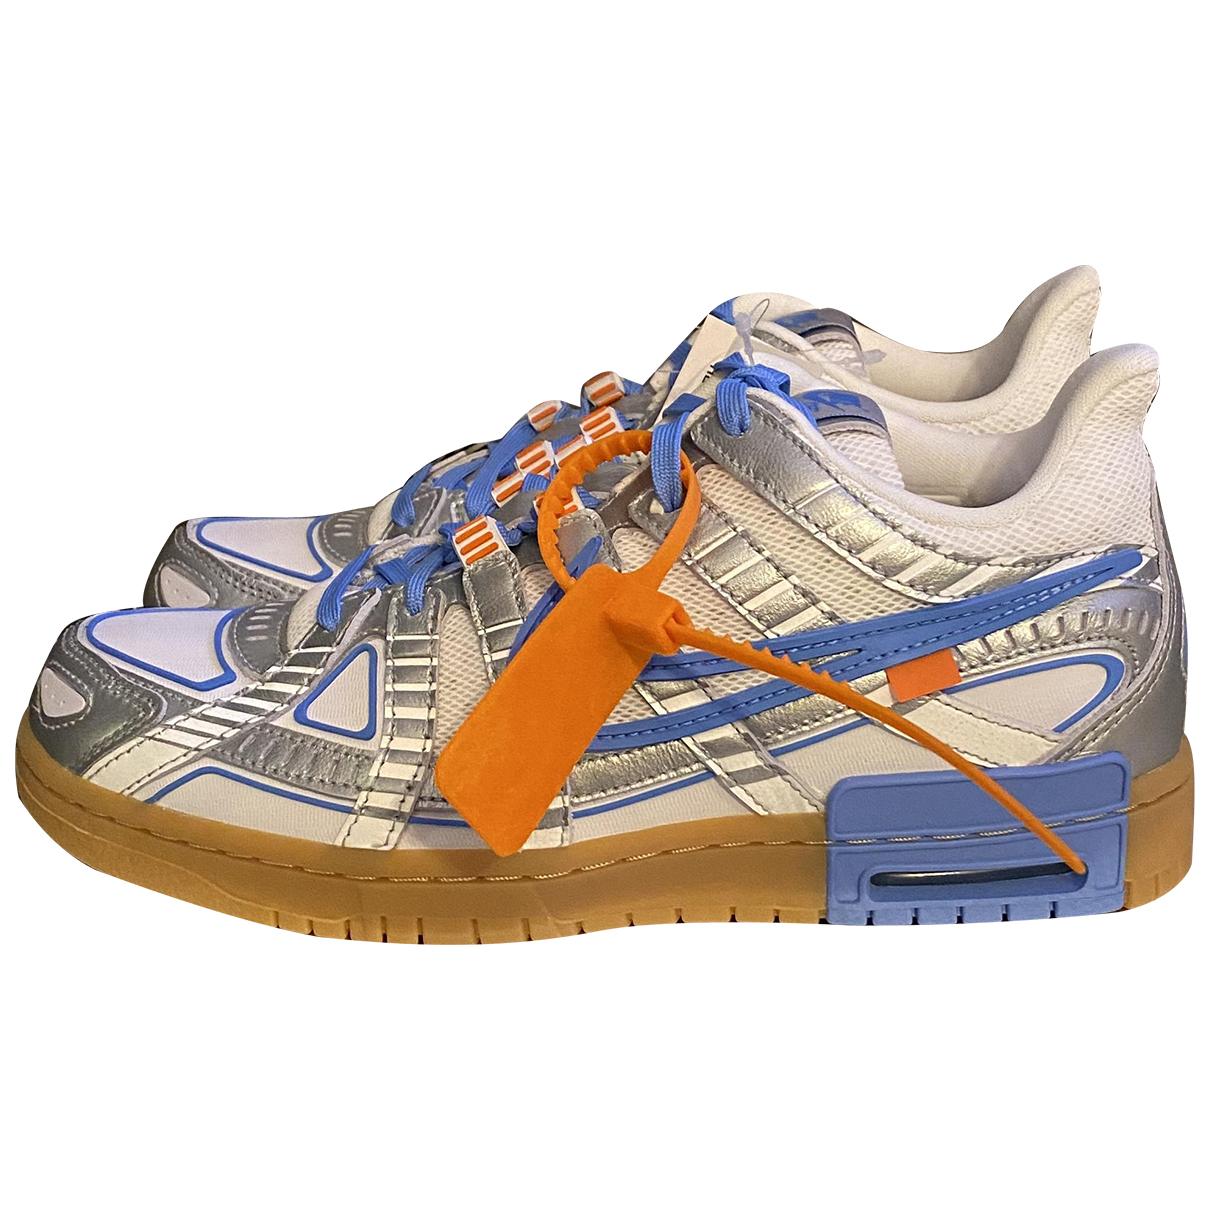 Nike X Off-white Rubber Dunk Sneakers in  Blau Leder